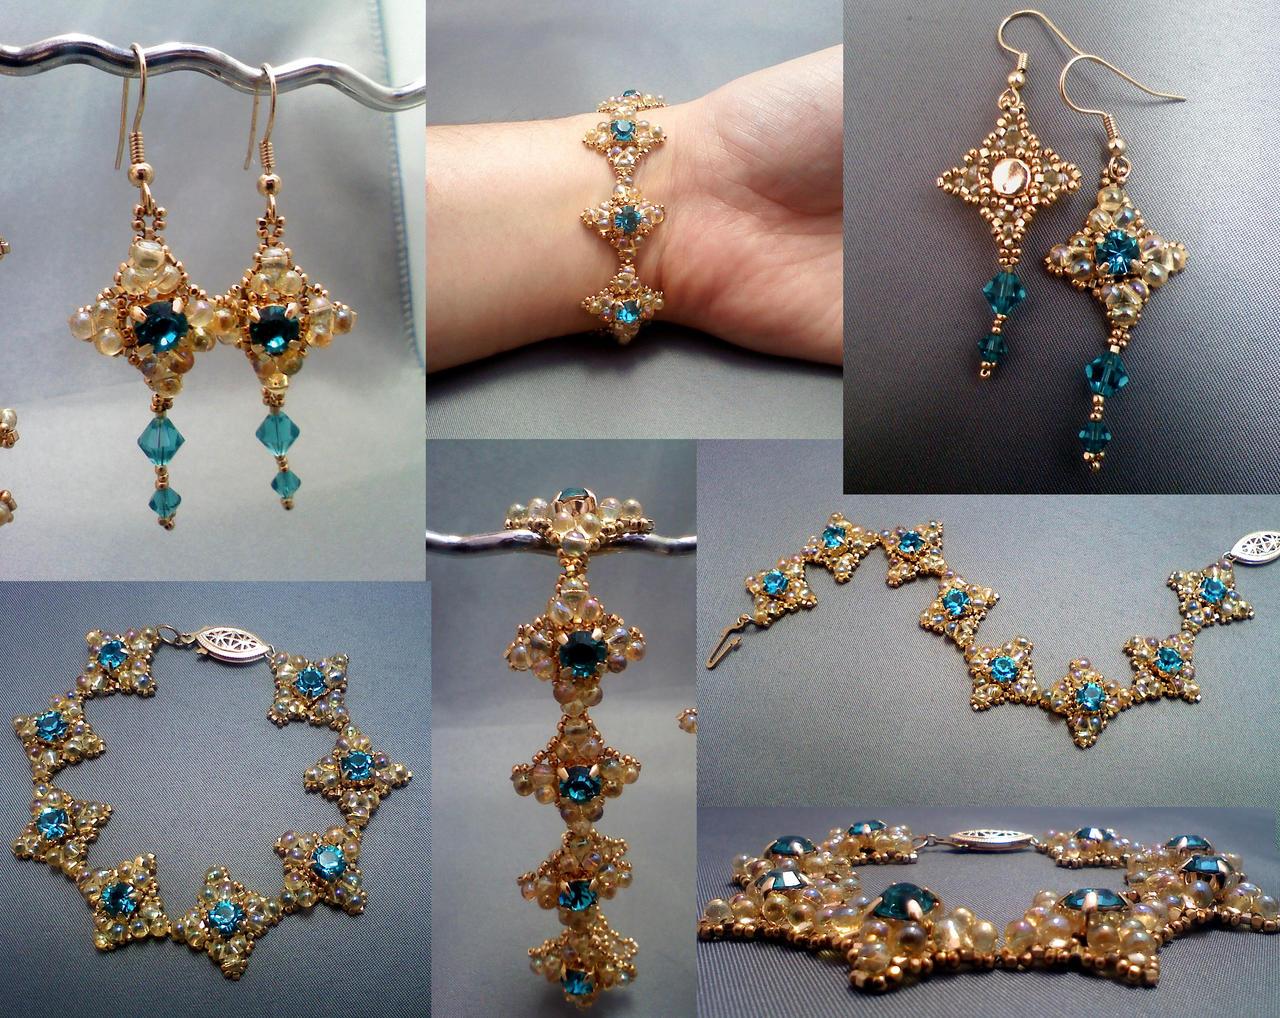 Coronet Bracelet Set Collage by beadg1rl